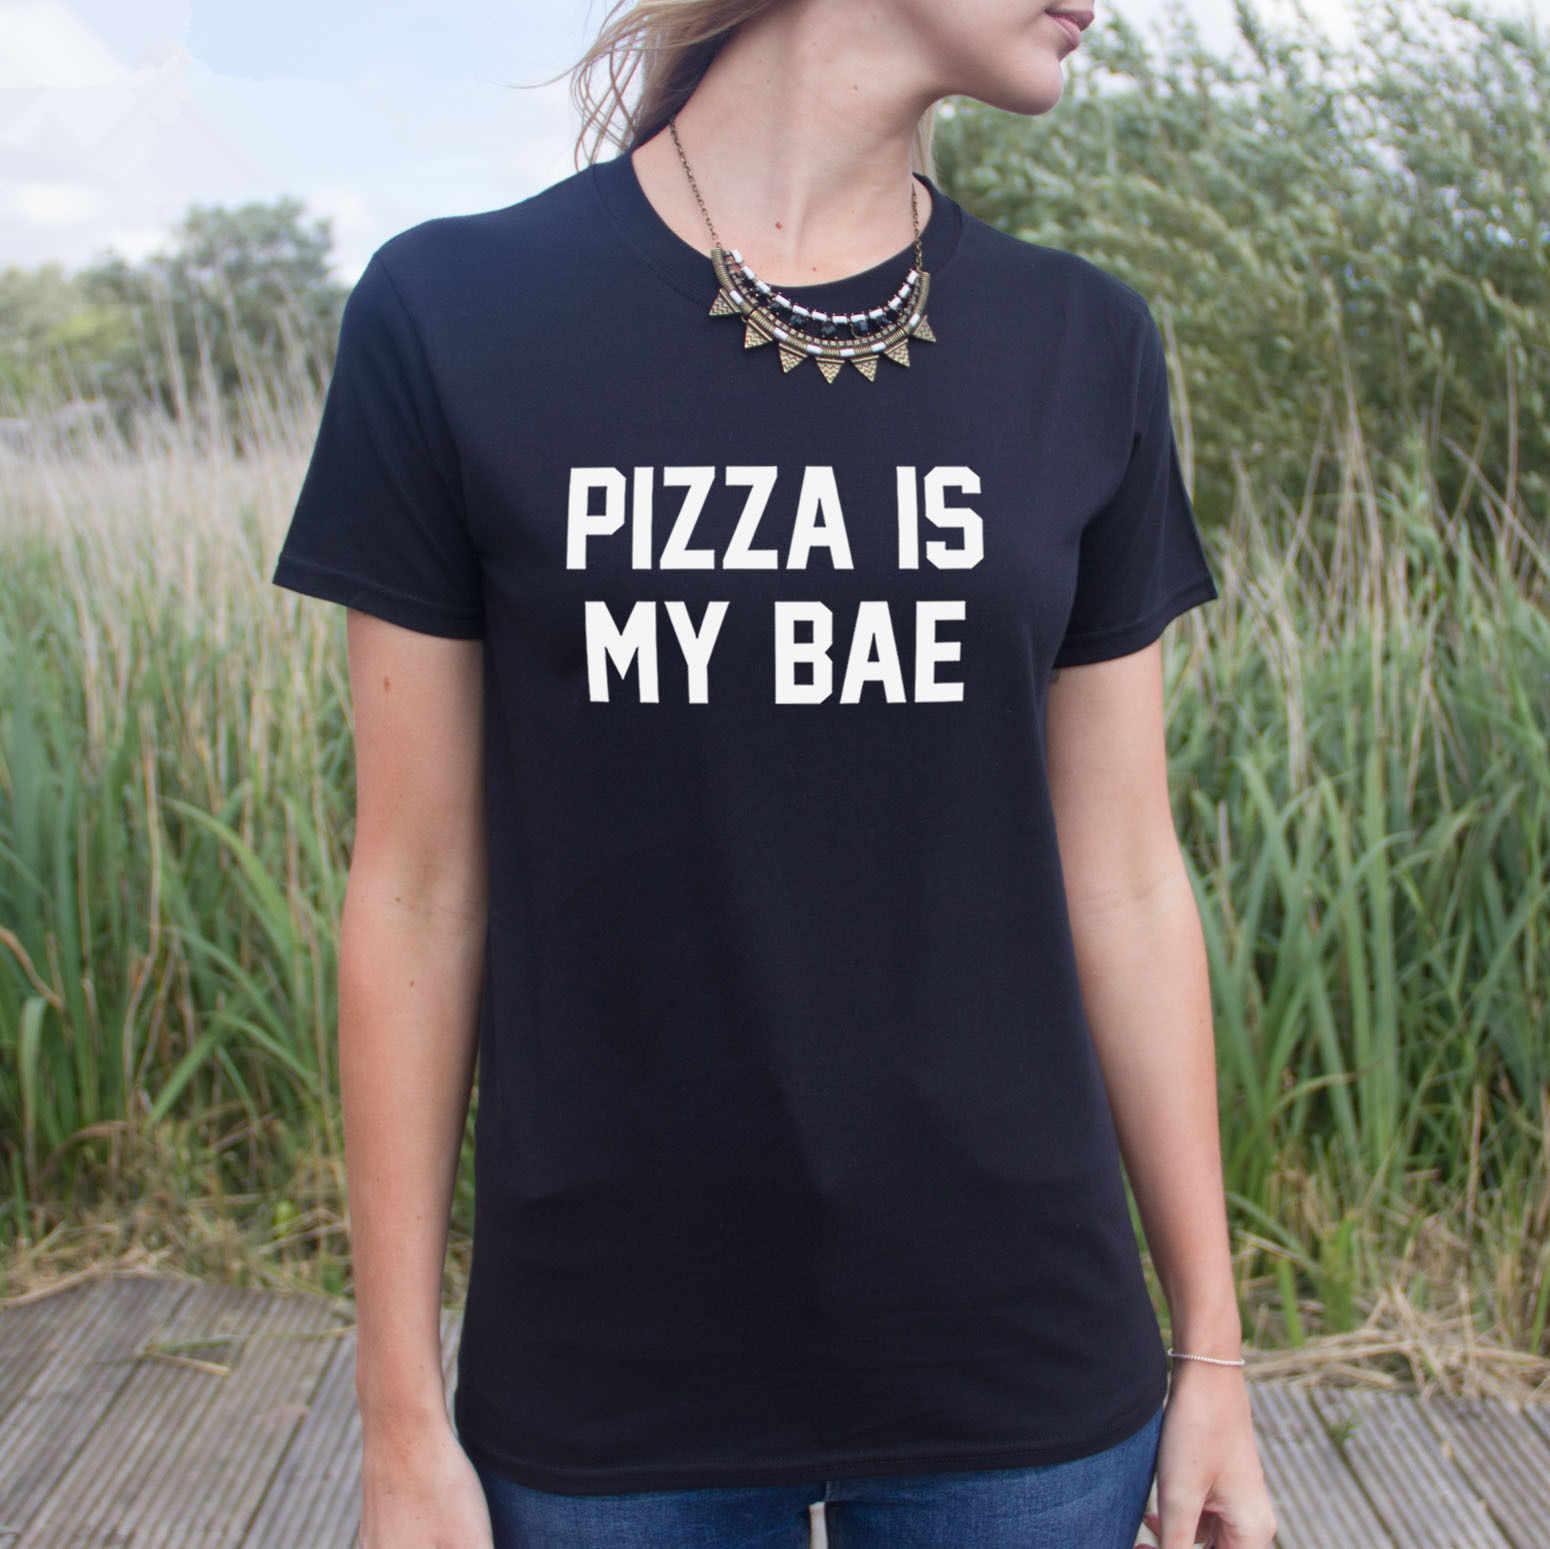 Женские топы Pizza Is My Bae t shirt Top You Got A Or Nah Fresh Love слоган ломтик модные подарки